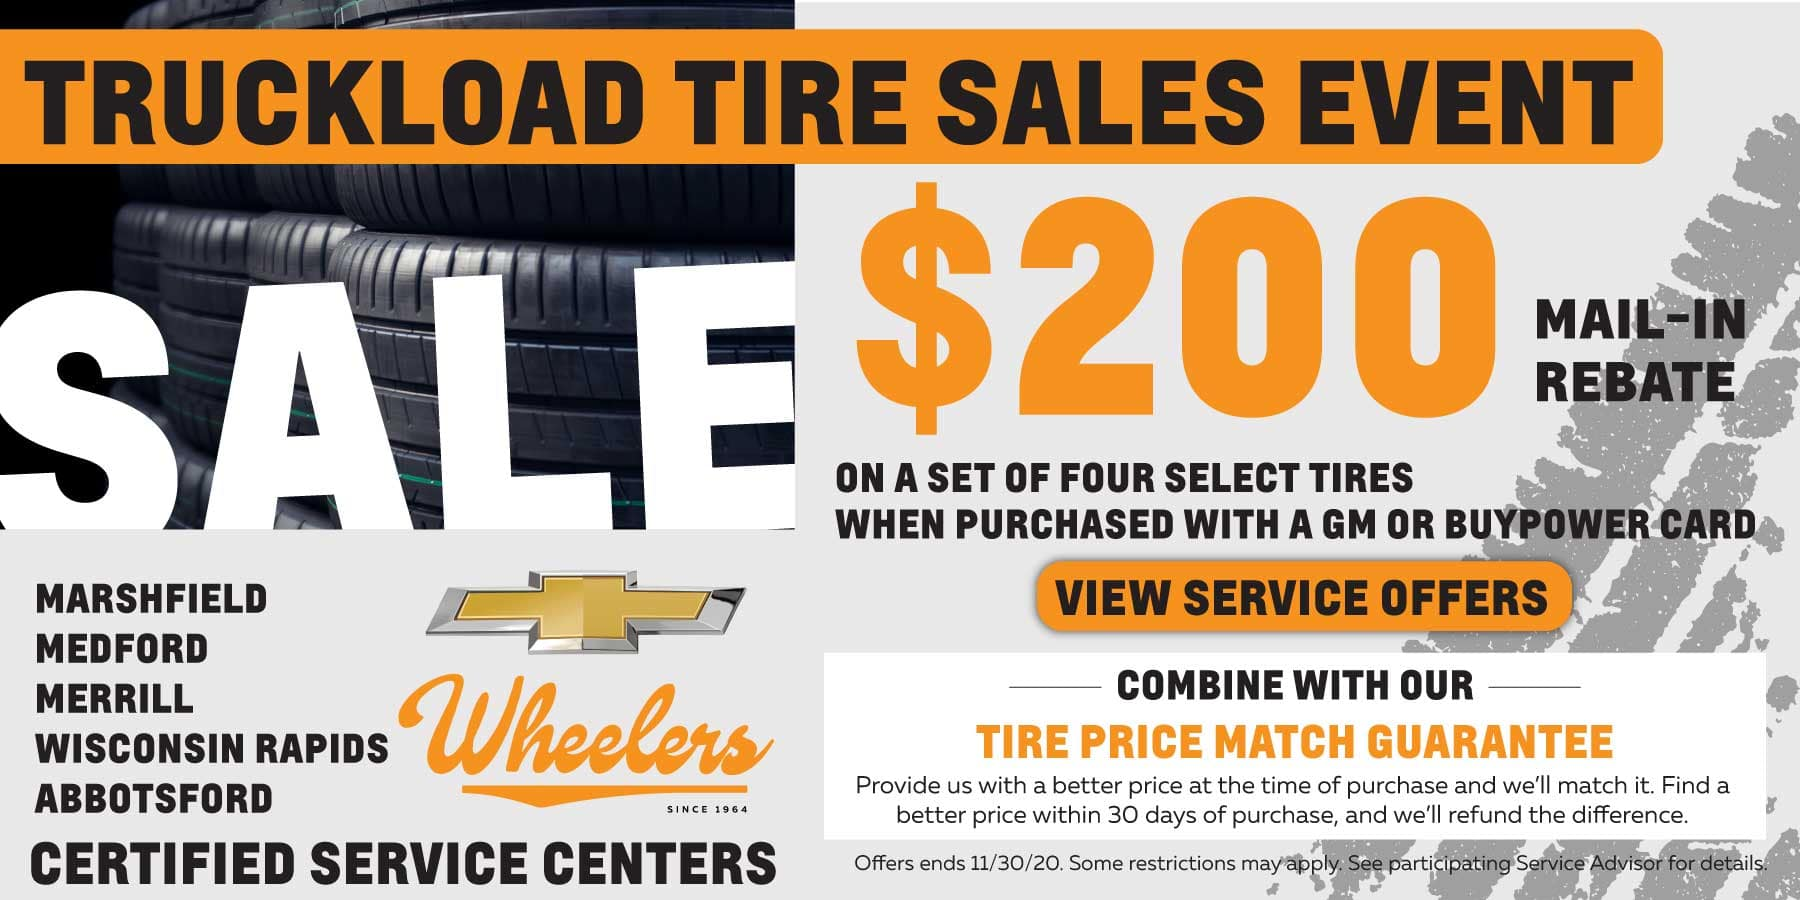 Truckload Tire Sales Event